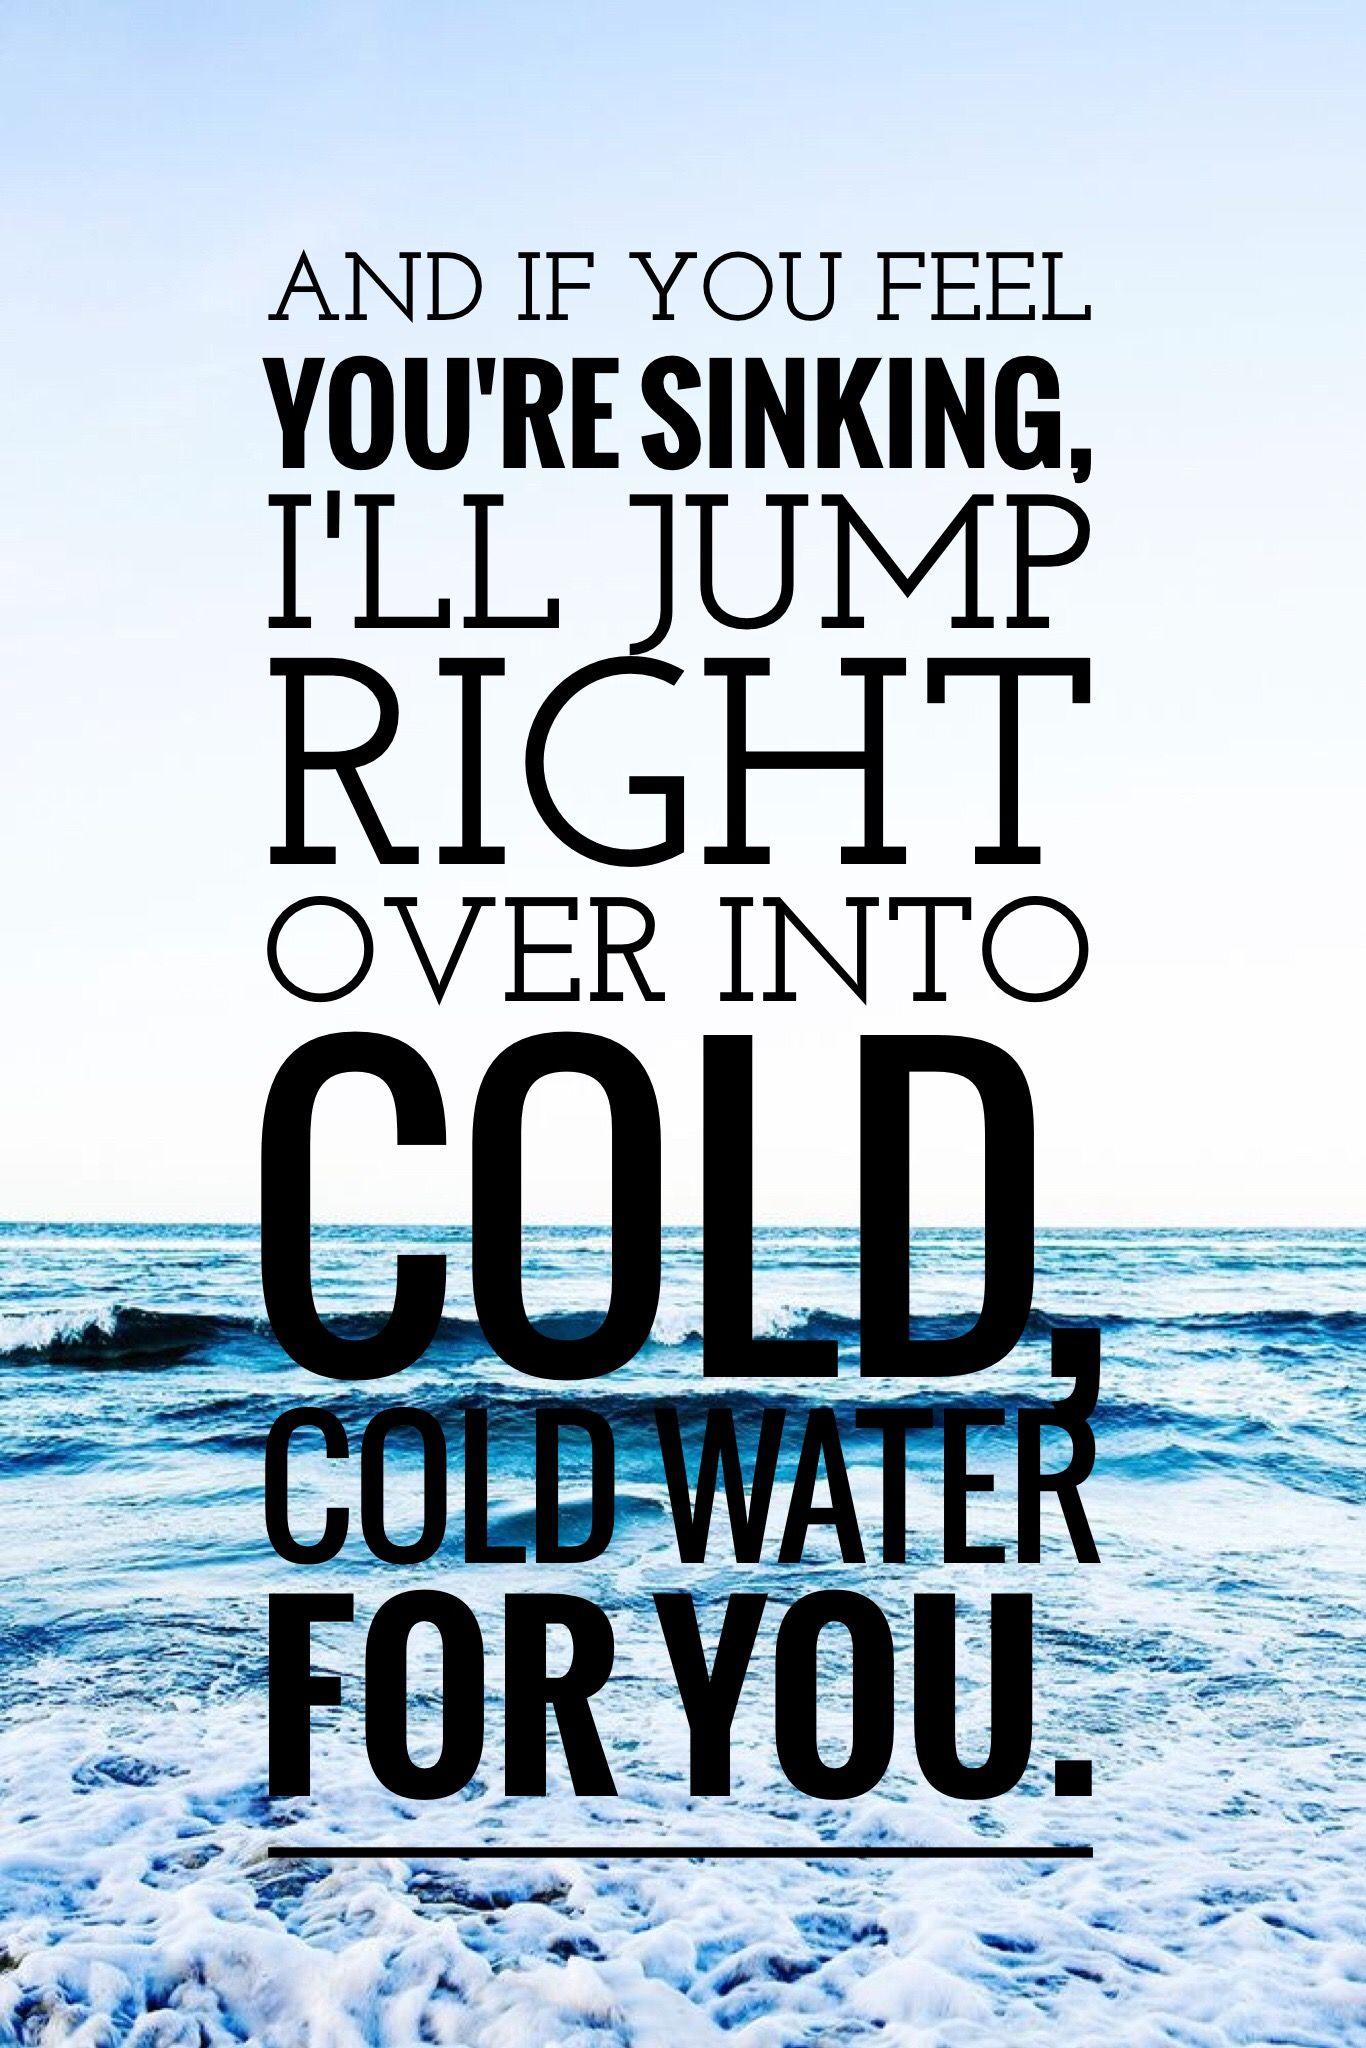 citater om justin bieber Major lazer Justin Bieber quotes wallpaper lyrics cold water  citater om justin bieber